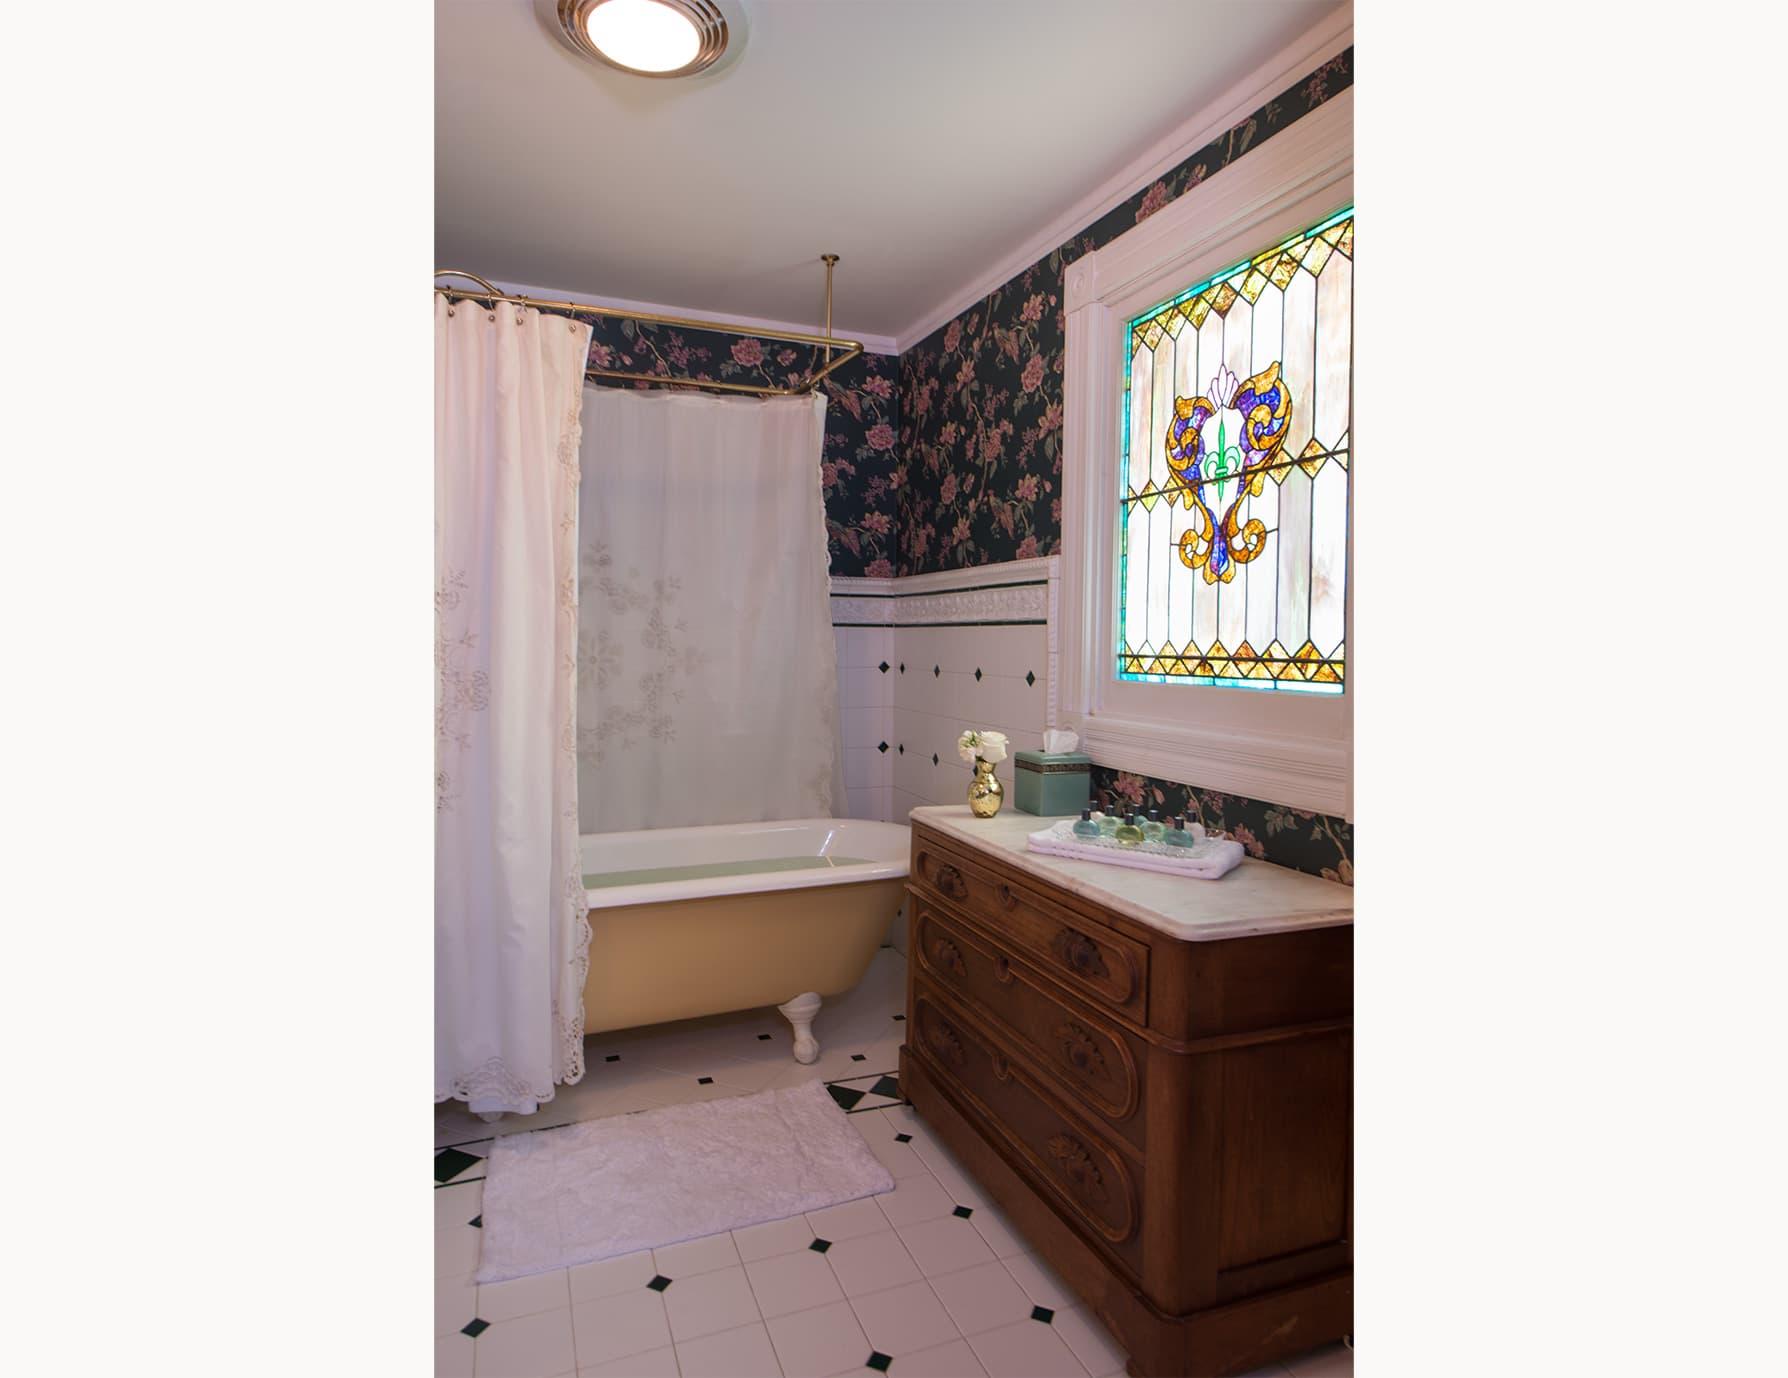 Inn on Roanoke Island Clawfoot Tub and Cabinet